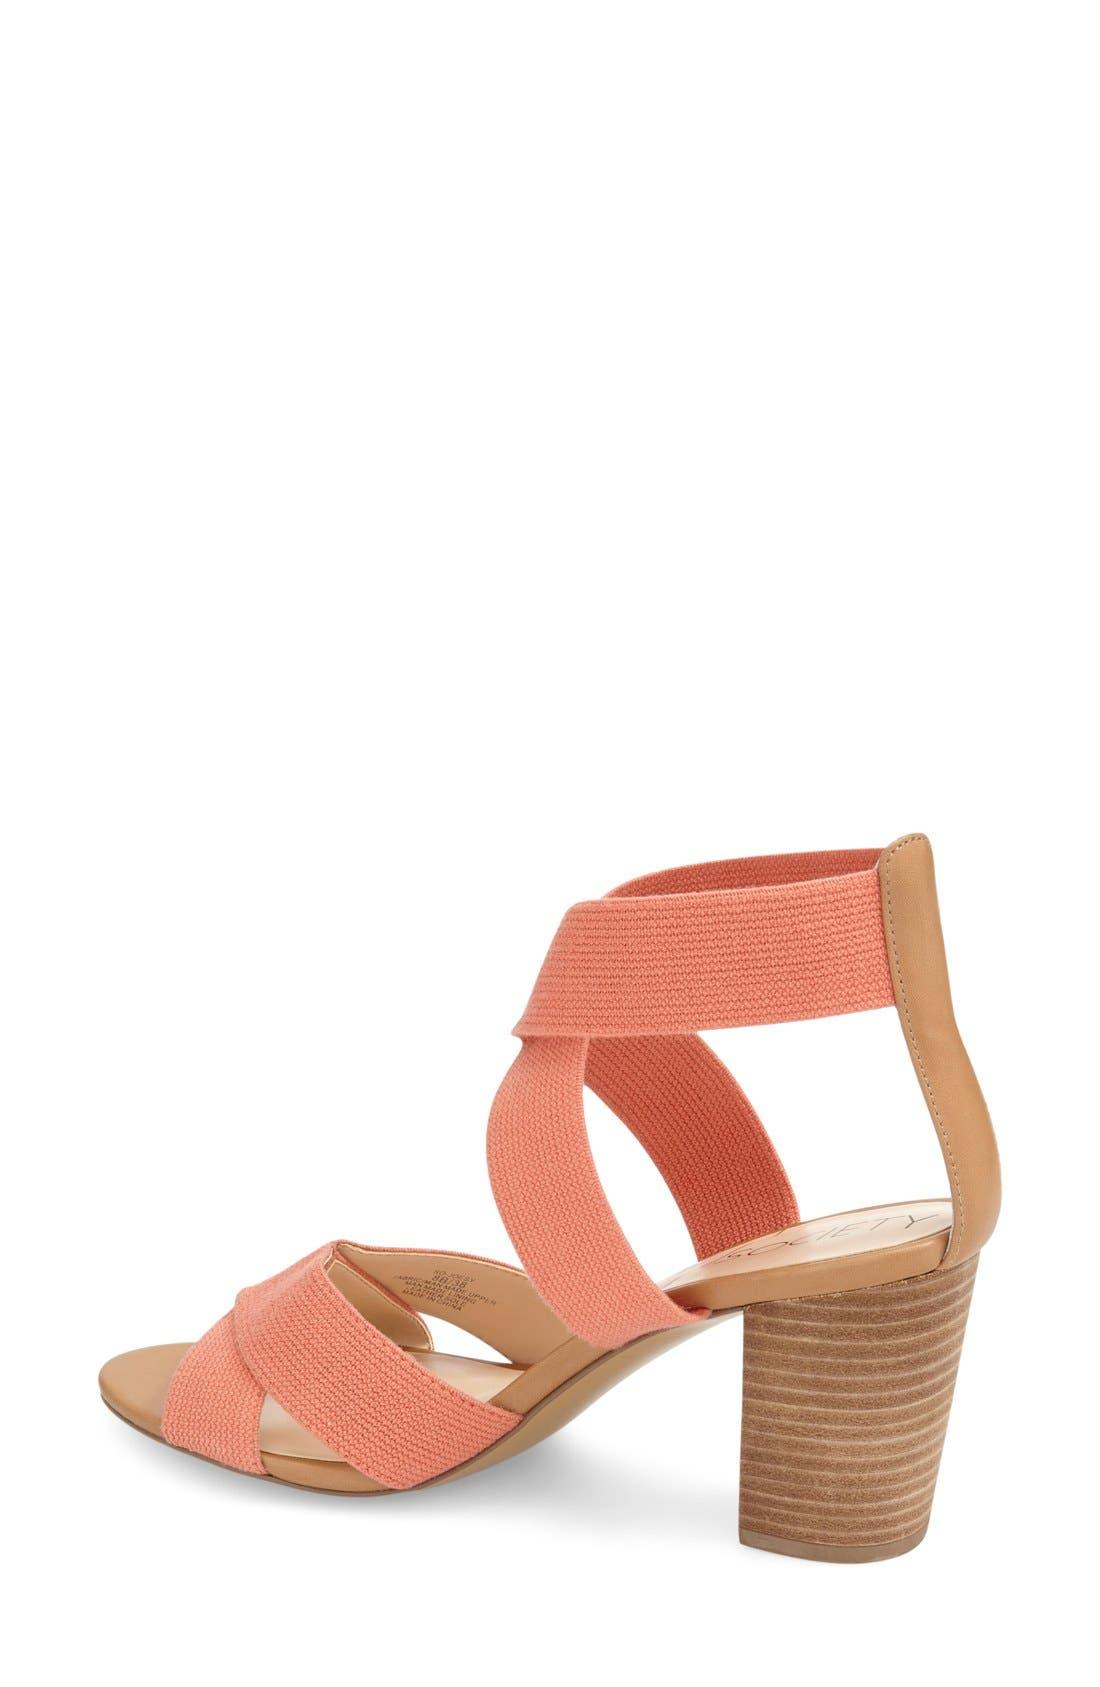 ,                             'Joesy' Block Heel Sandal,                             Alternate thumbnail 10, color,                             200